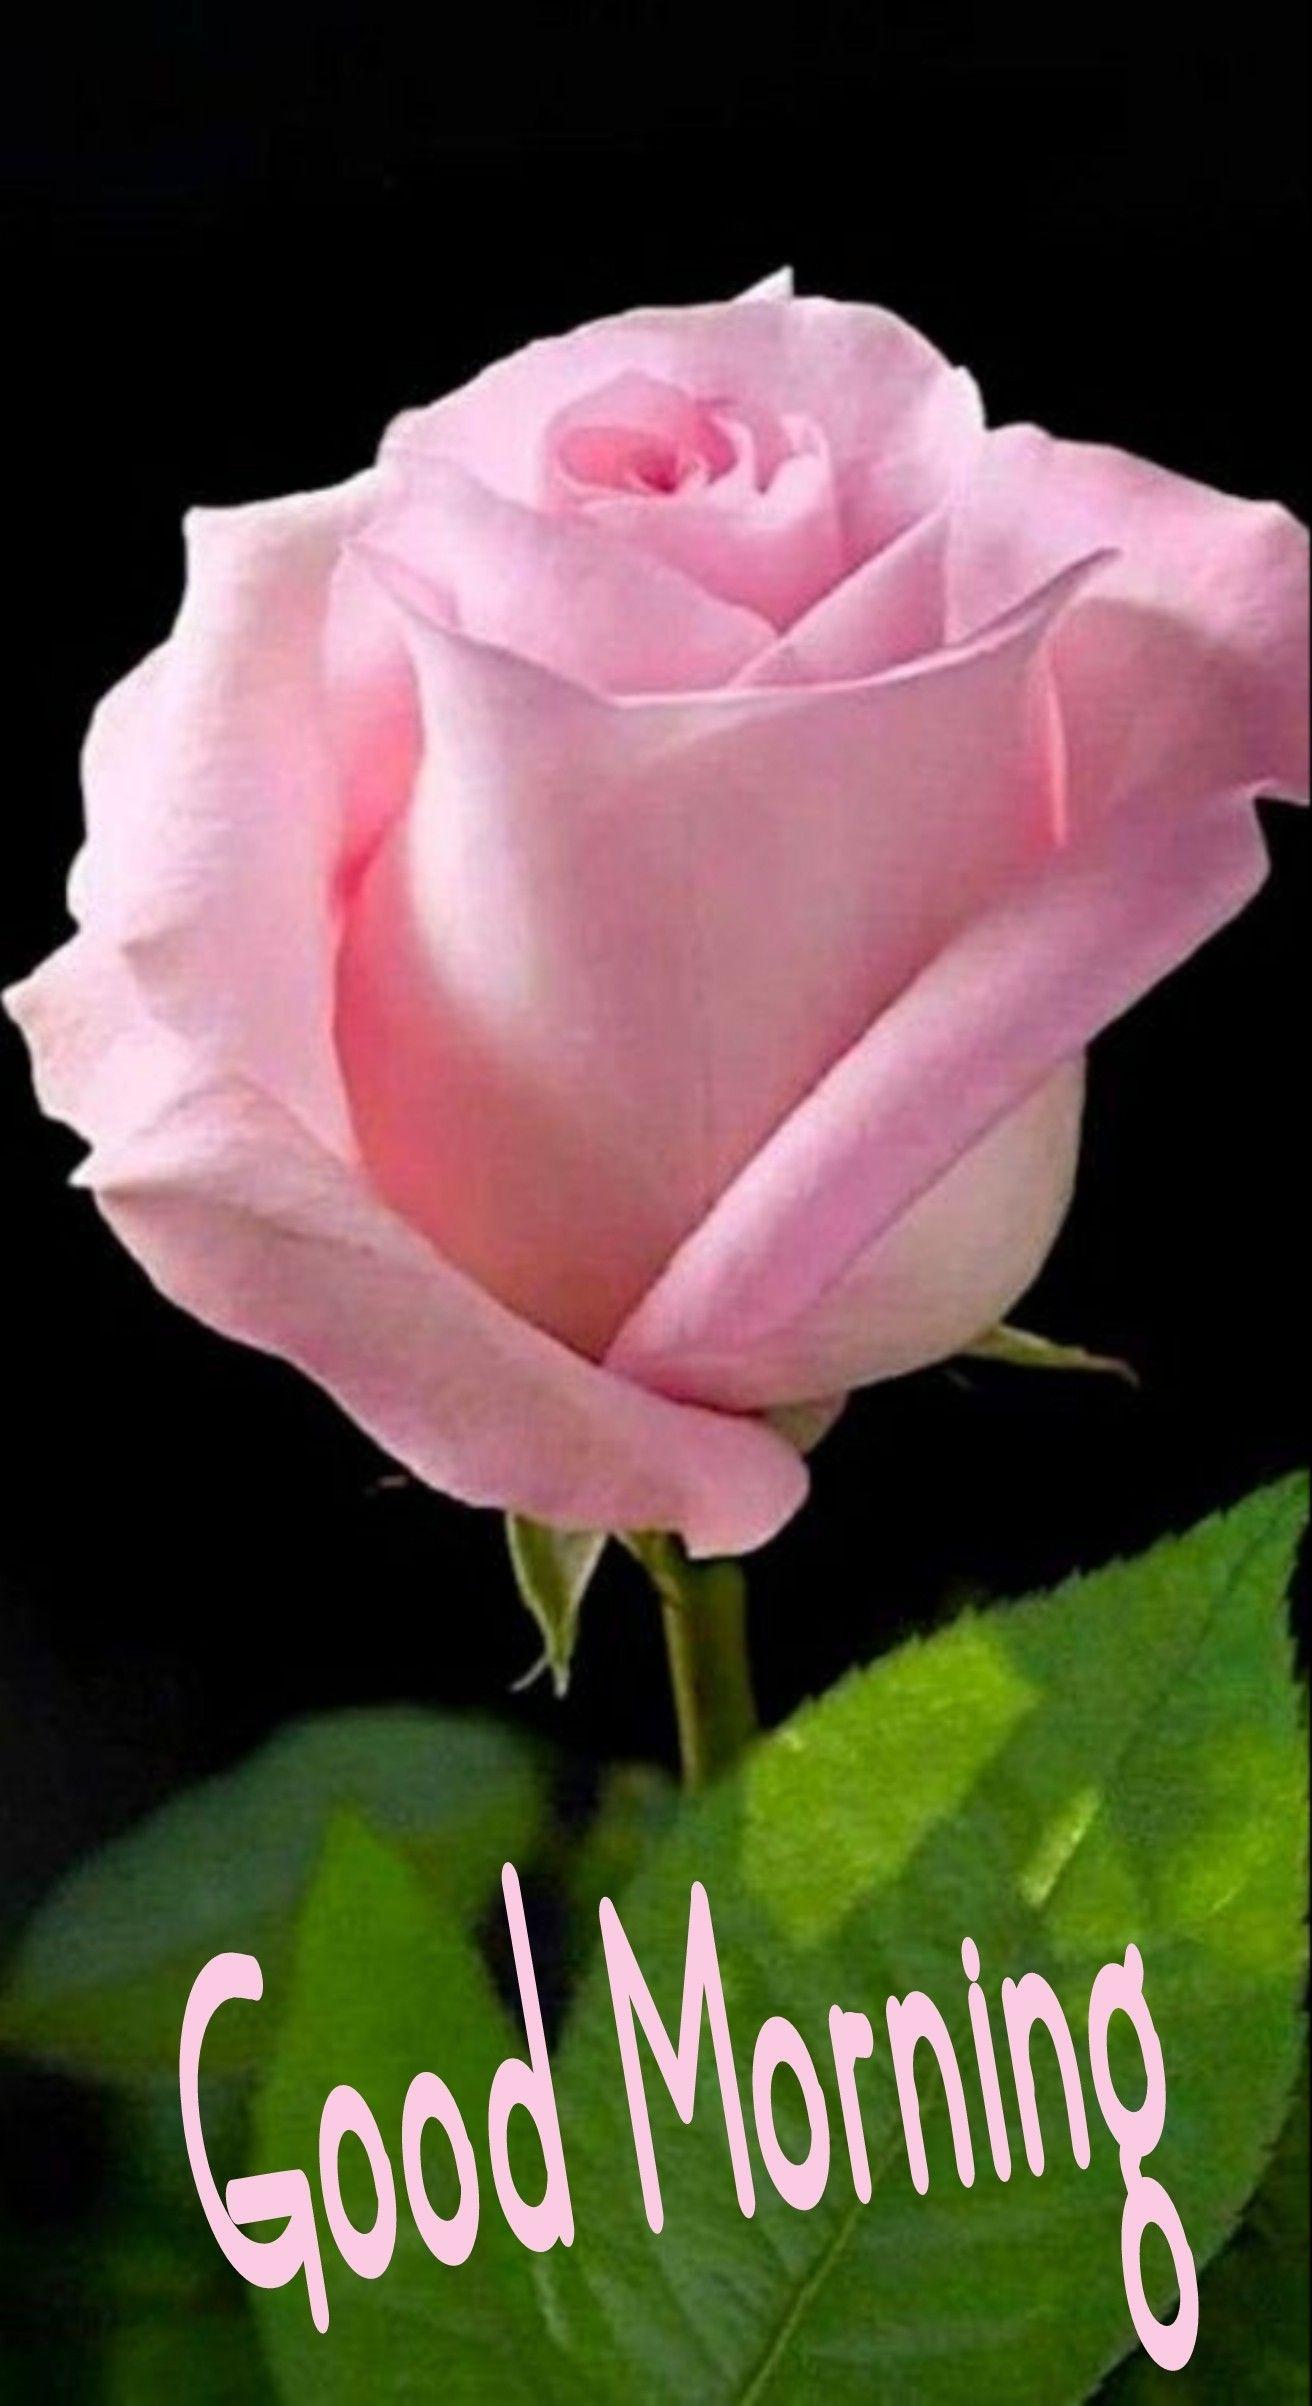 Pin By Vikram Joshi On Morning Wishes Good Morning Romantic Good Morning Love Rose Flower Wallpaper